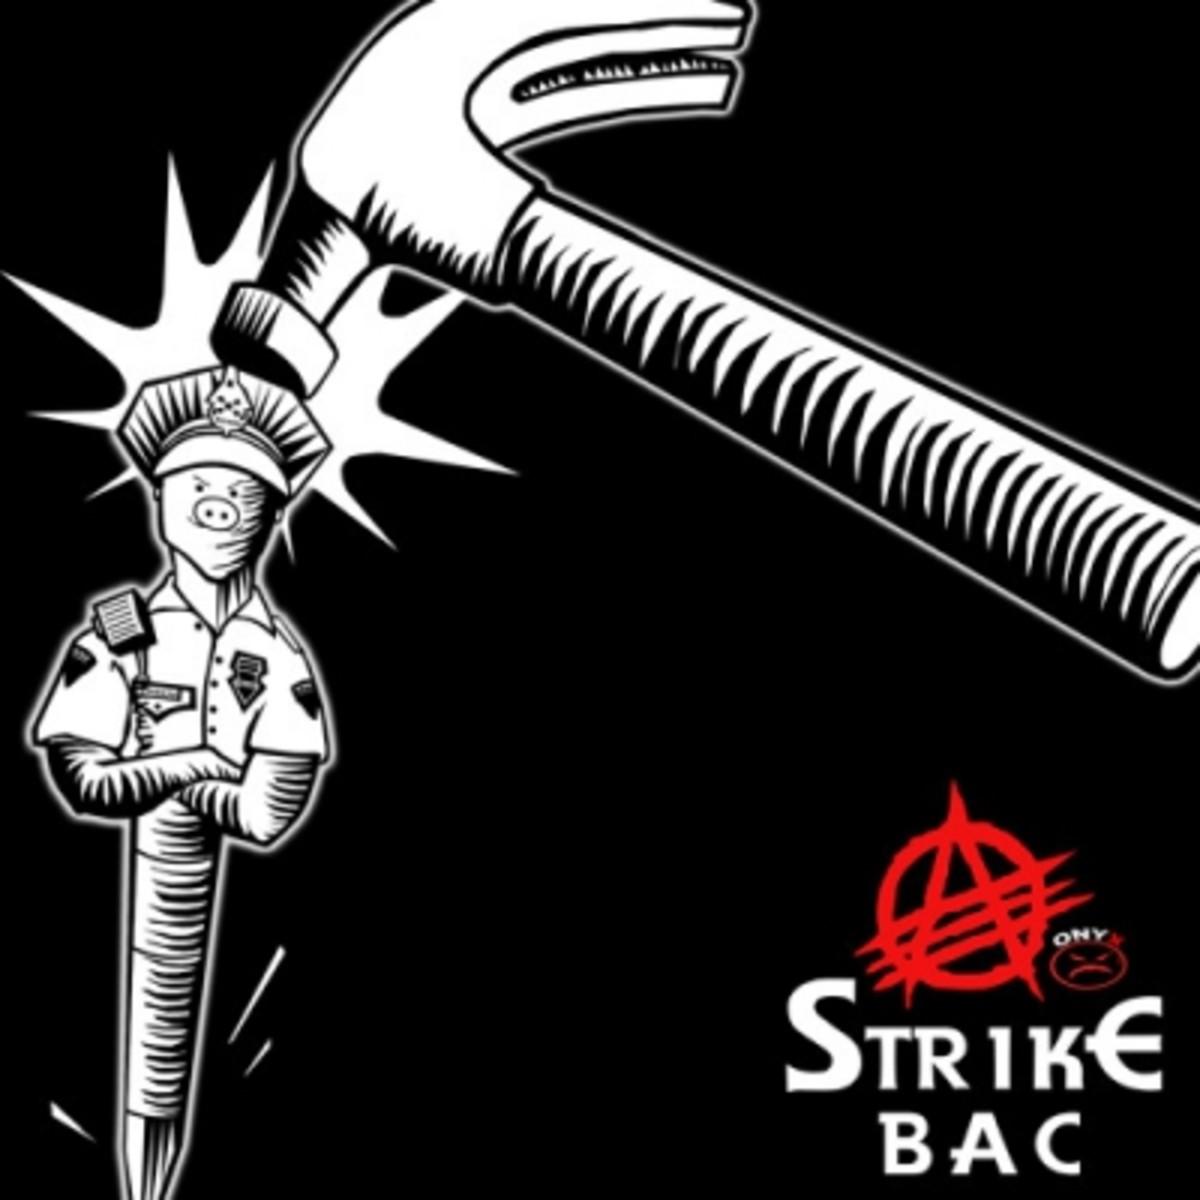 onyx-strike-bac.jpg